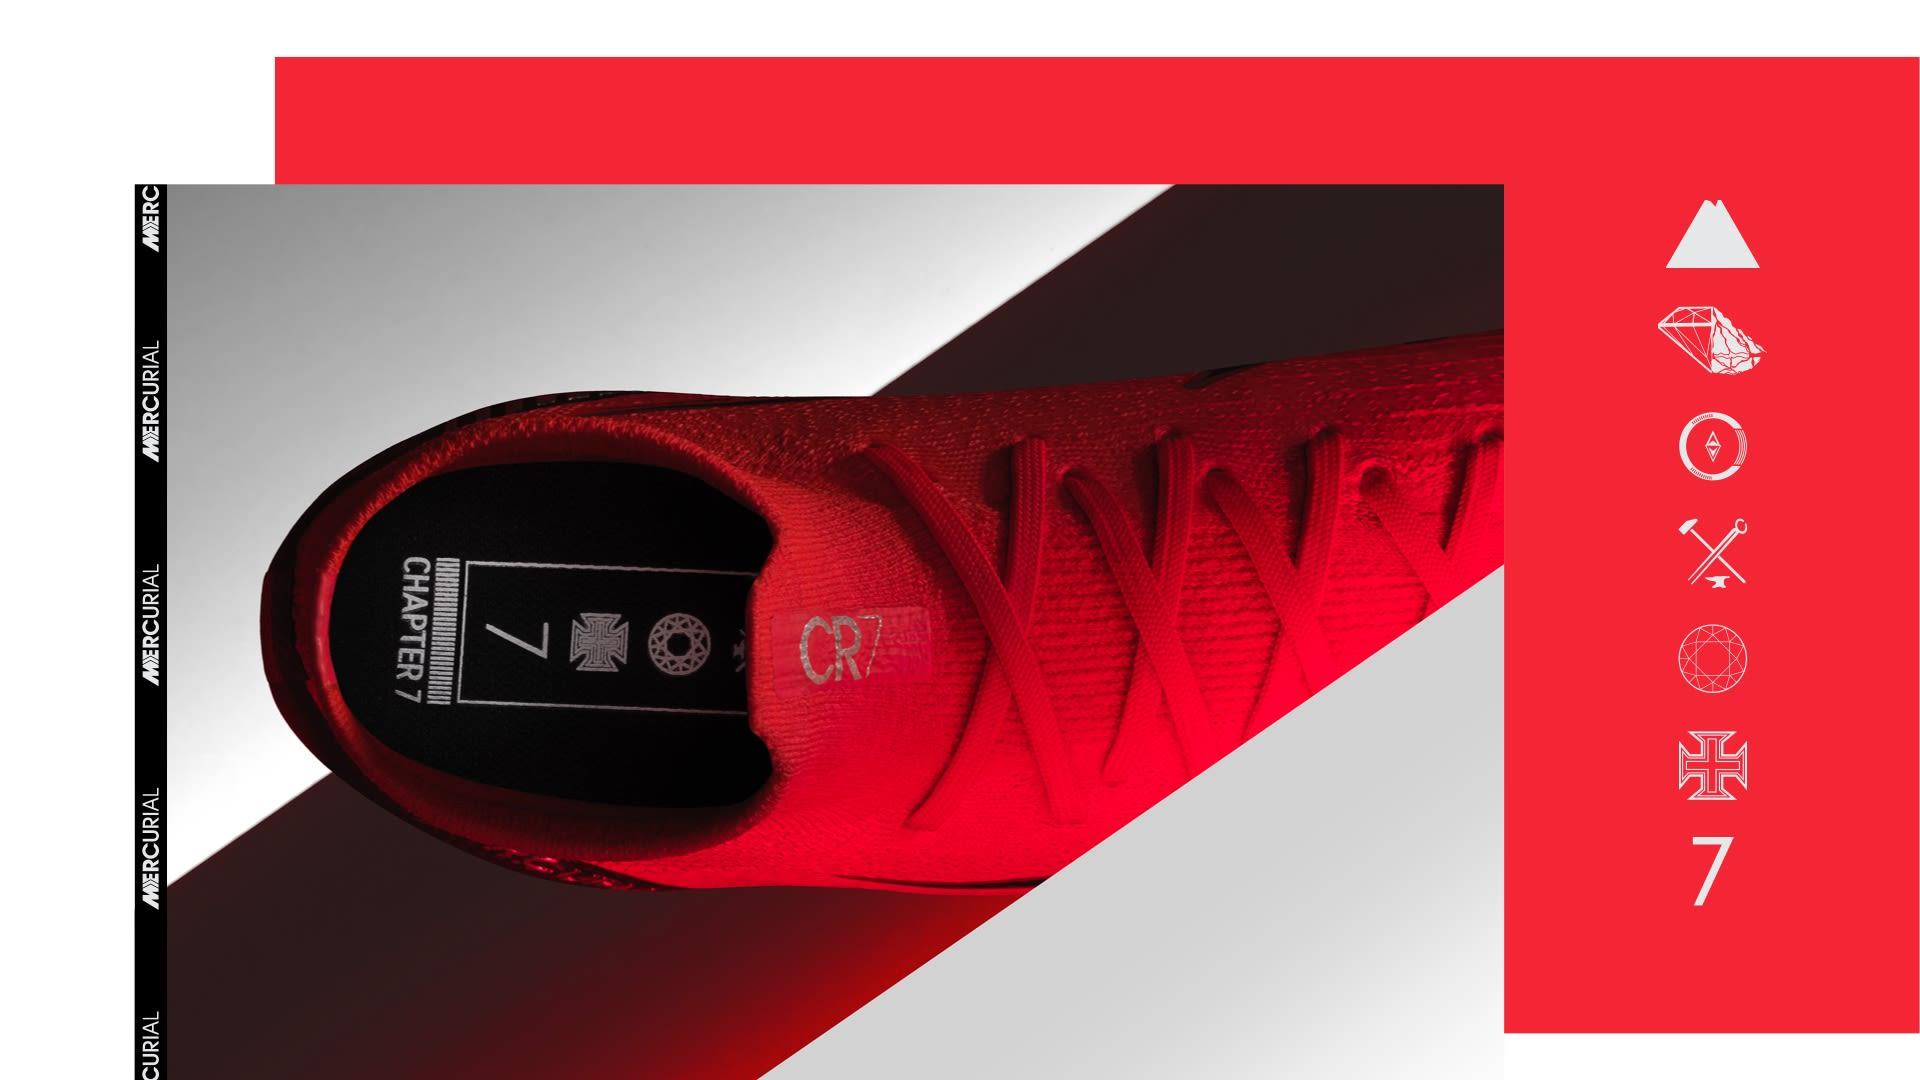 Chapter 7 Mercurial Superfly 360 Elite CR7 FG. Nike.com ES bd6b70c05d59b